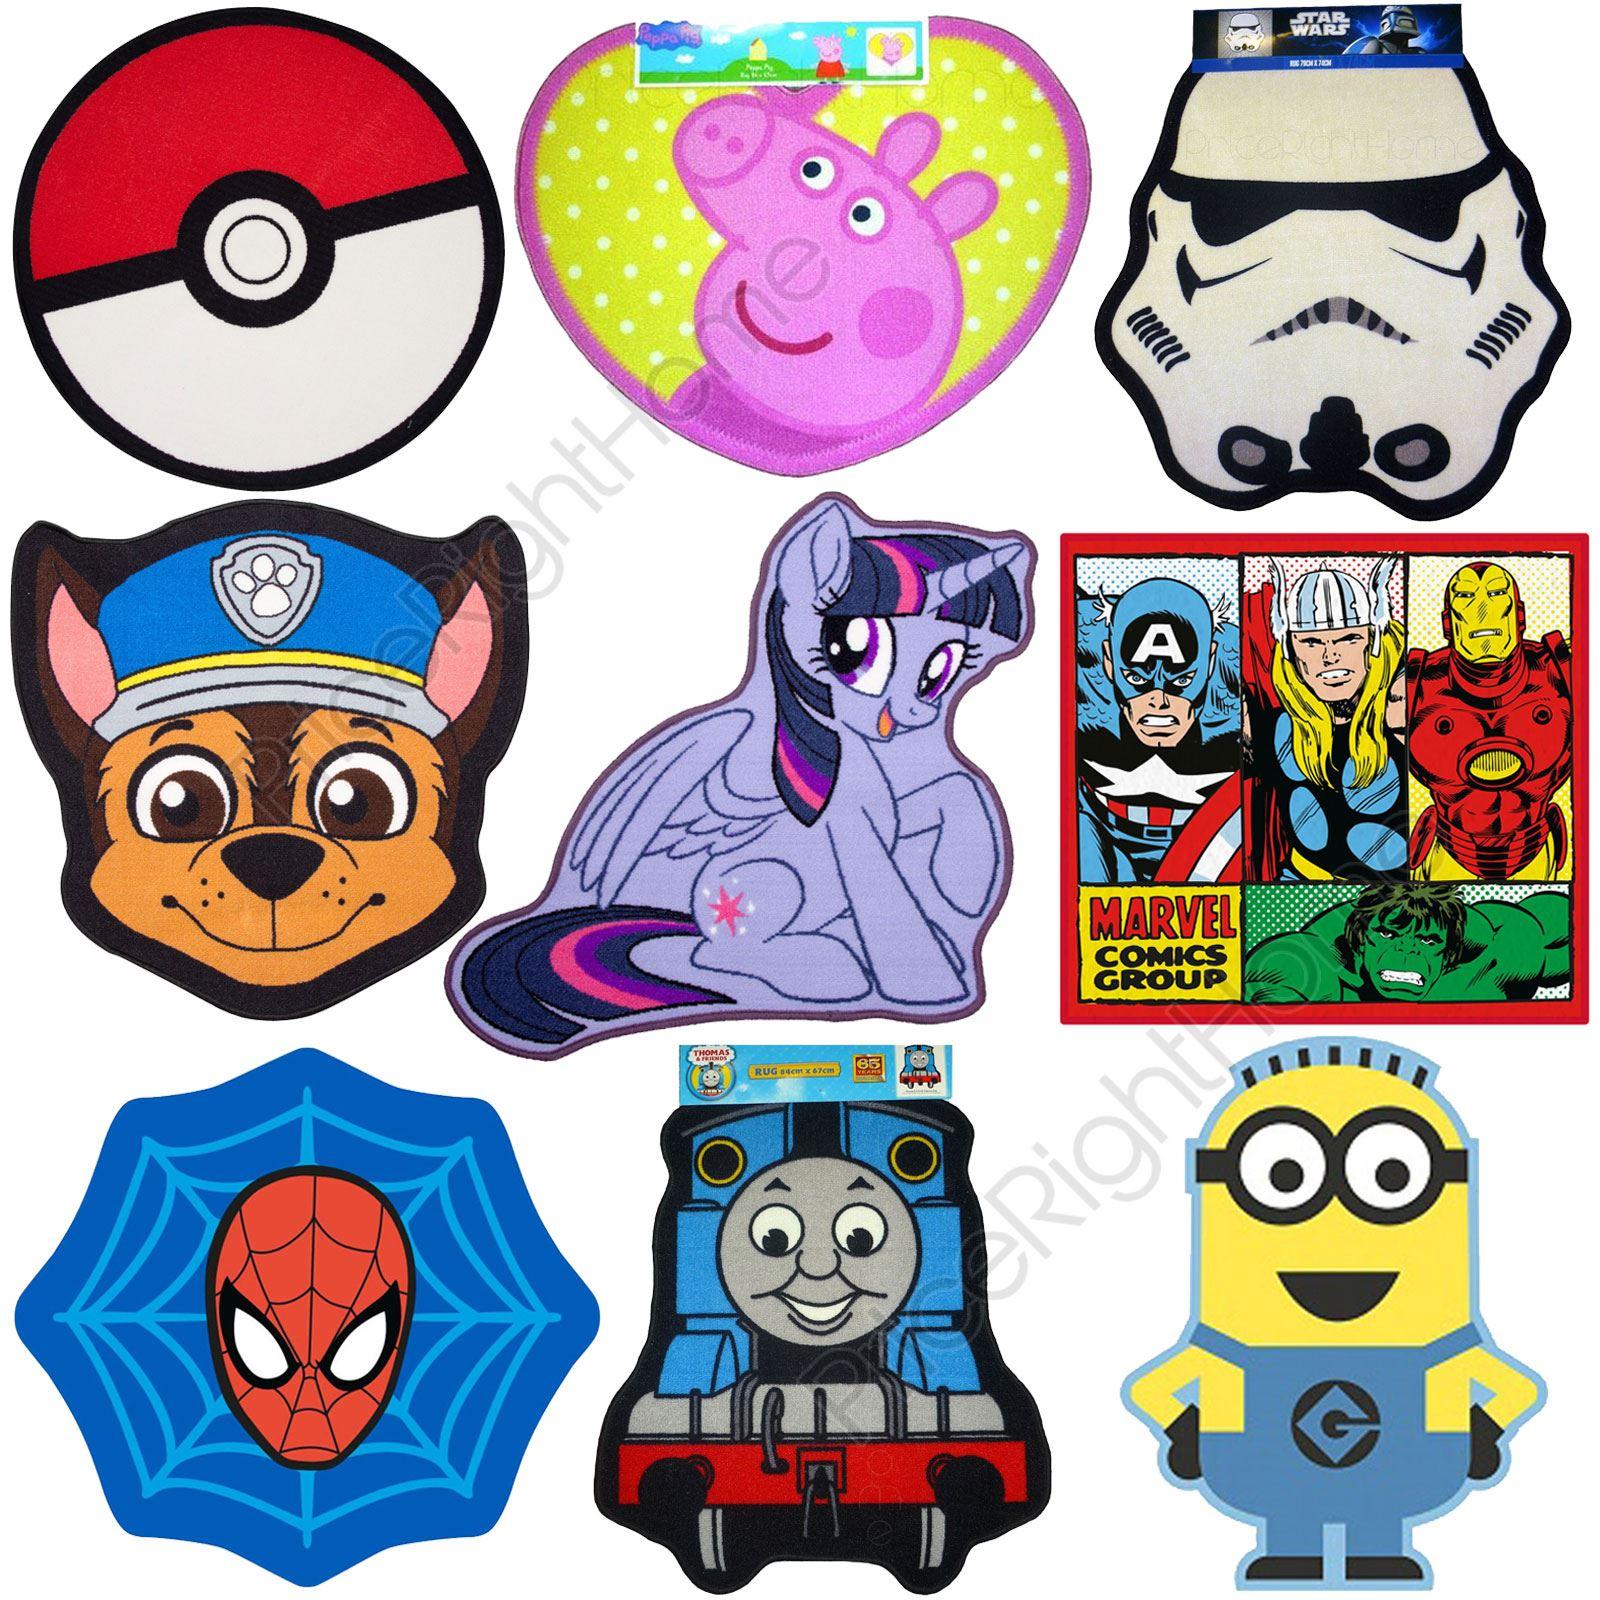 Awe Inspiring Details About Kids Character Disney Floor Mats Rugs Peppa Pig Pokemon Thomas Minions Marvel Interior Design Ideas Tzicisoteloinfo